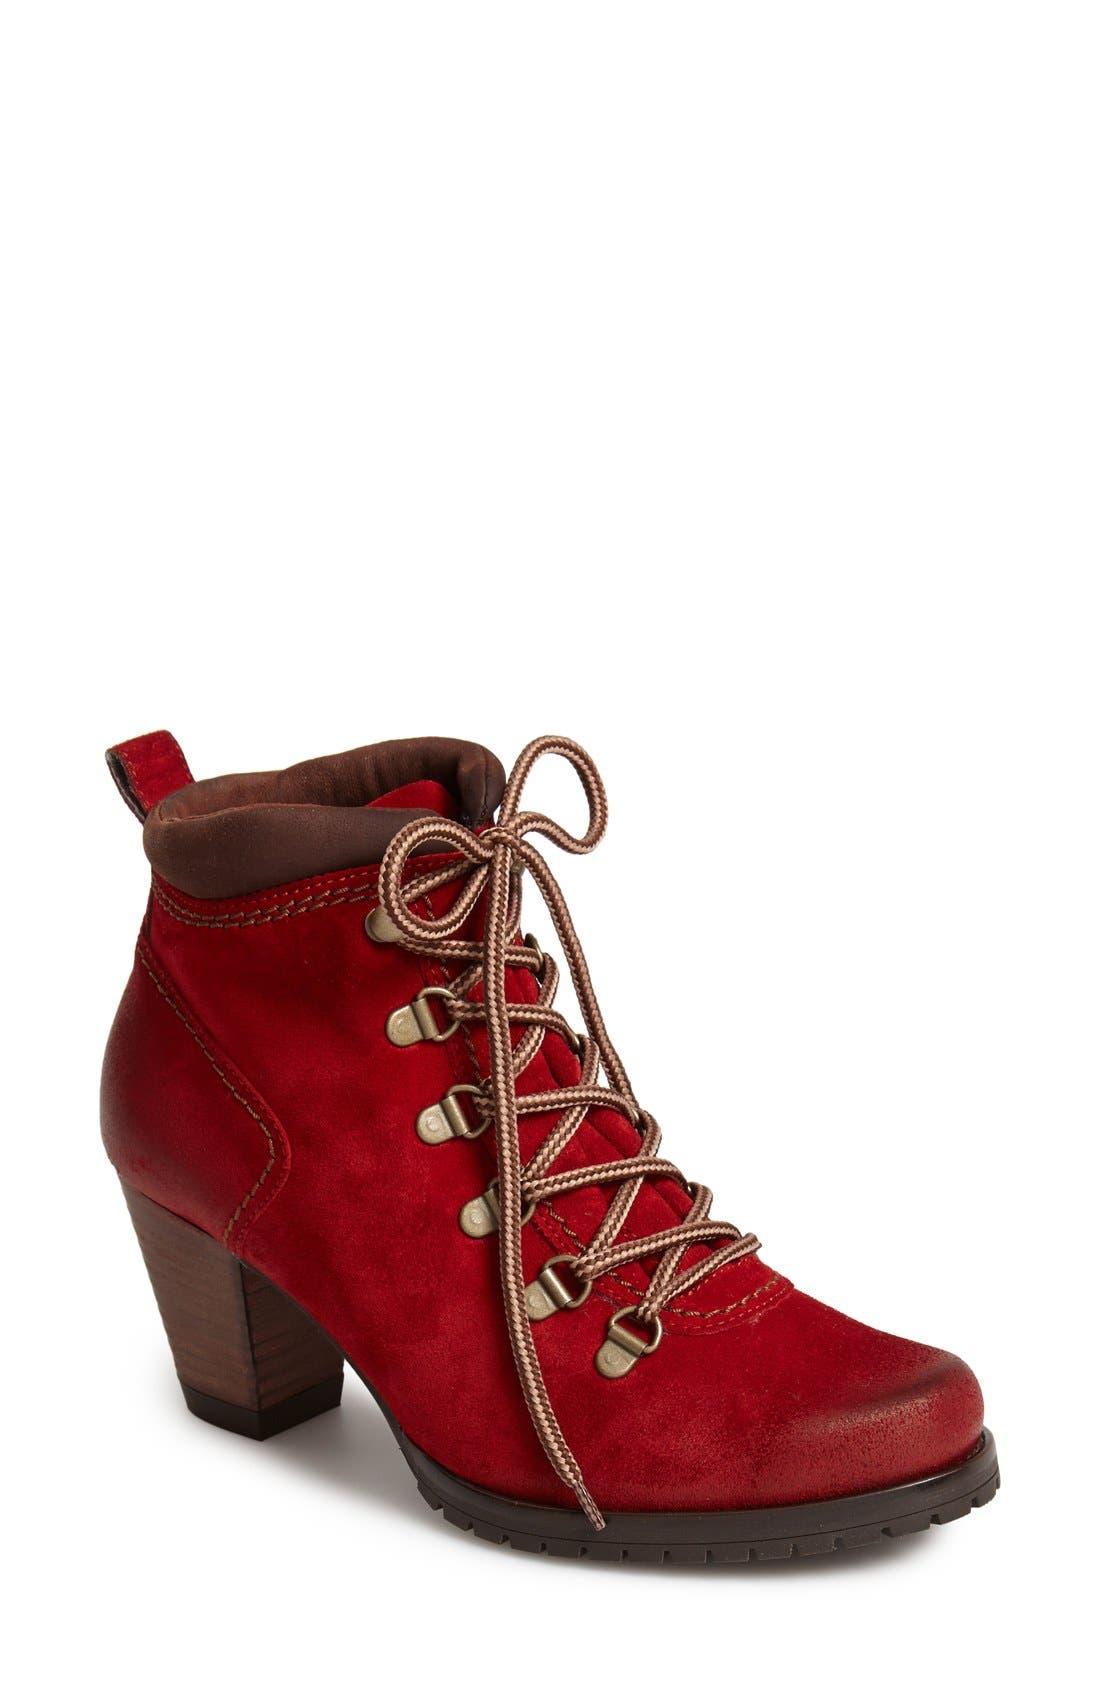 Main Image - Paul Green 'Boise' Leather Bootie (Women)